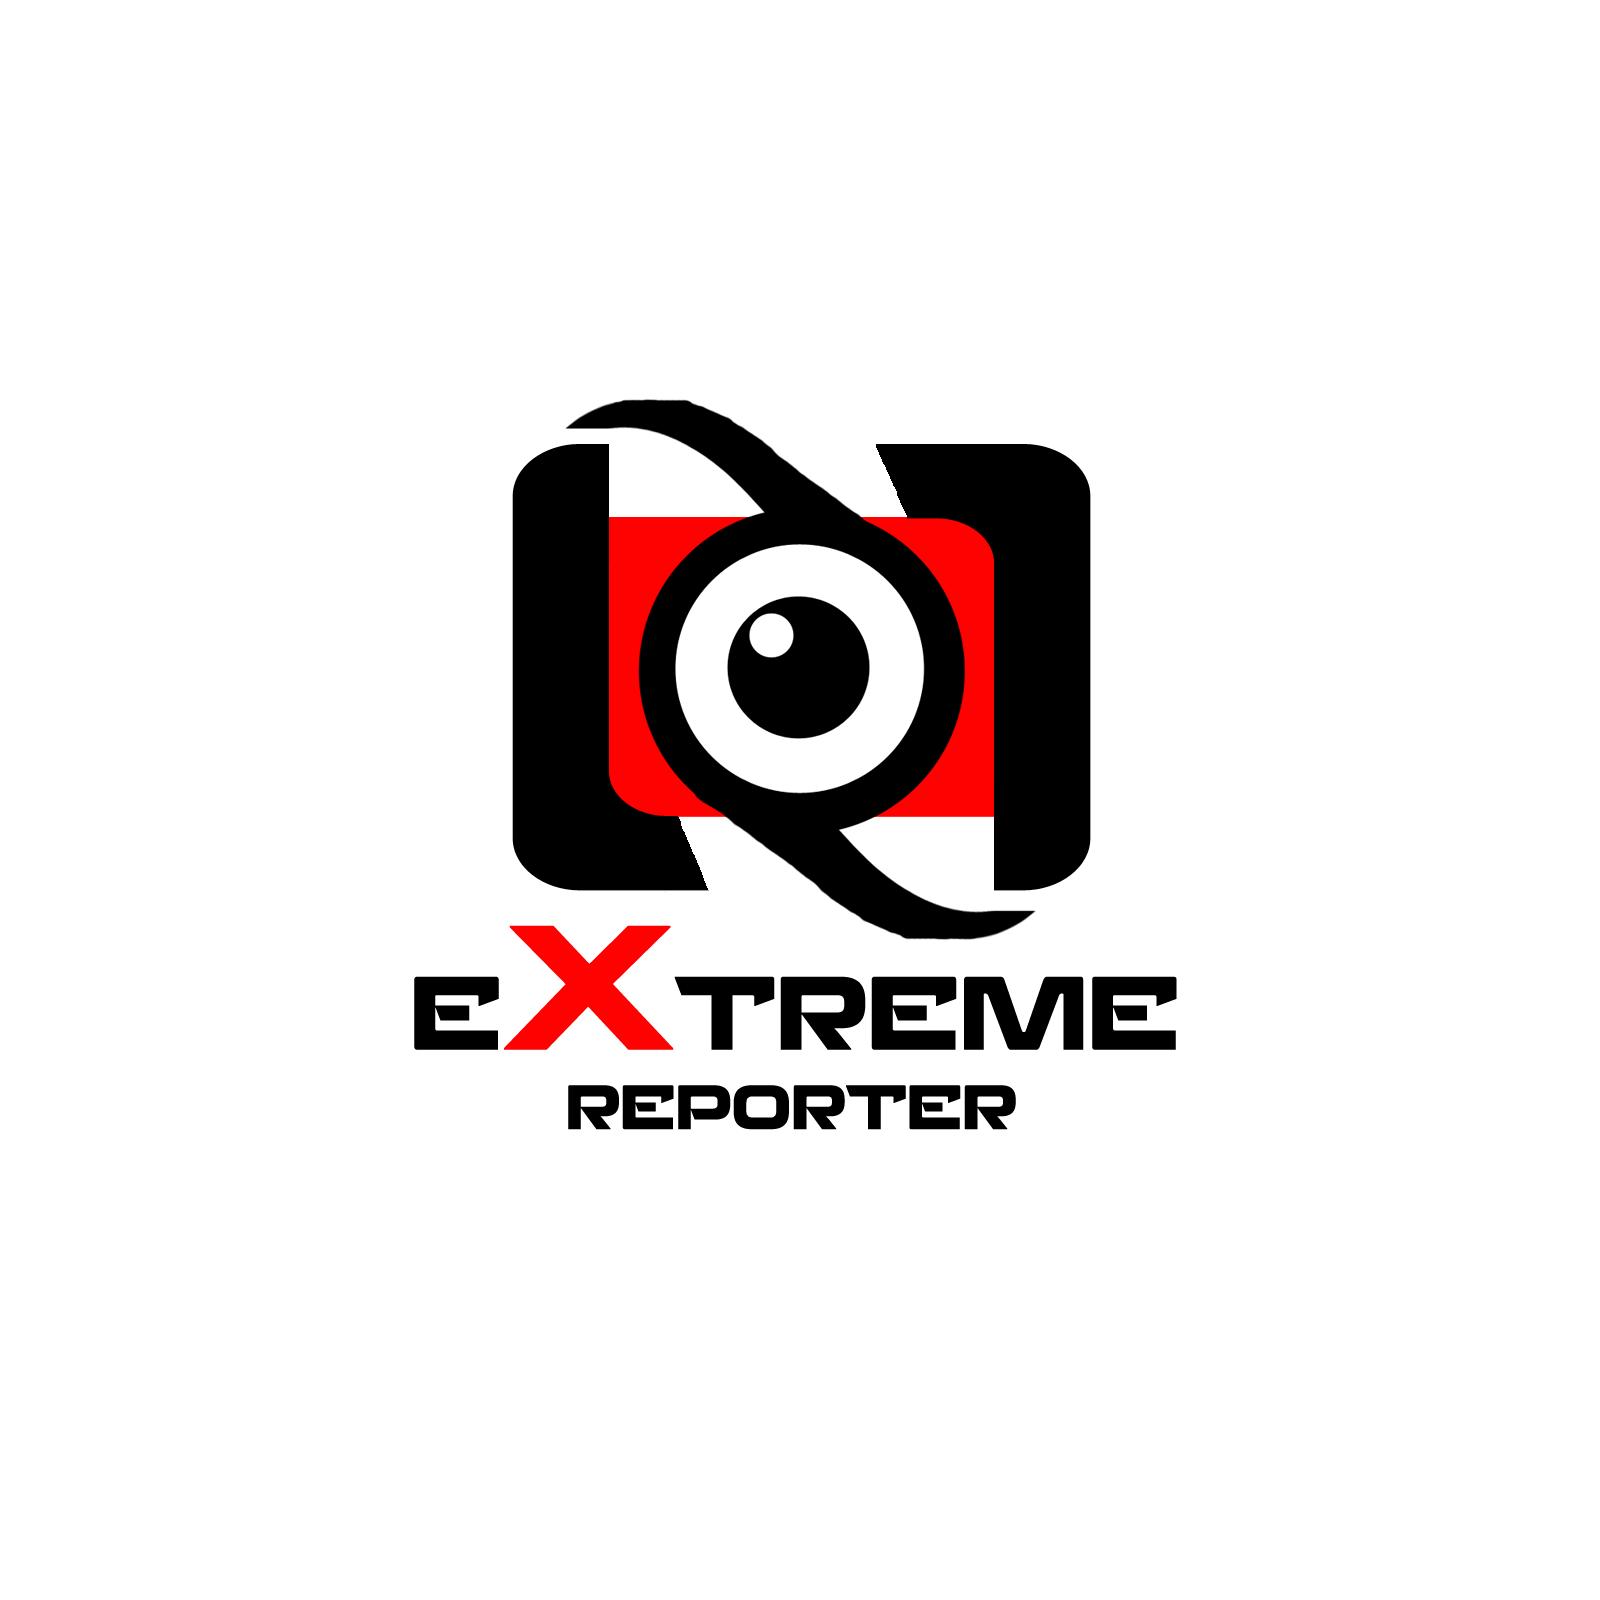 Логотип для экстрим фотографа.  фото f_6085a526e7a86b00.png